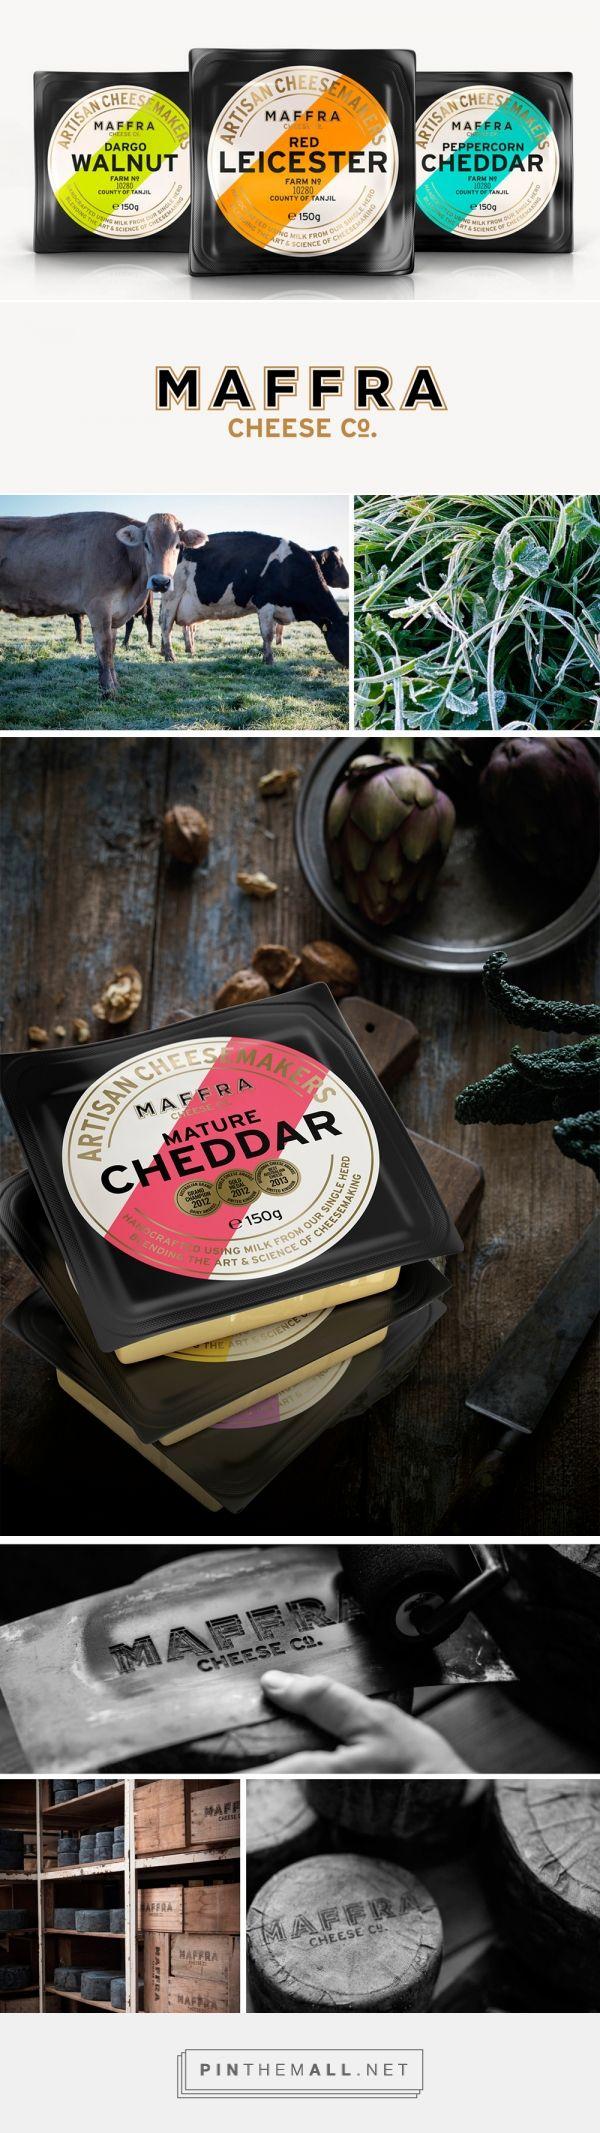 Maffra Cheese — The Dieline - Branding & Packaging - created via http://pinthemall.net (Bottle Packaging)